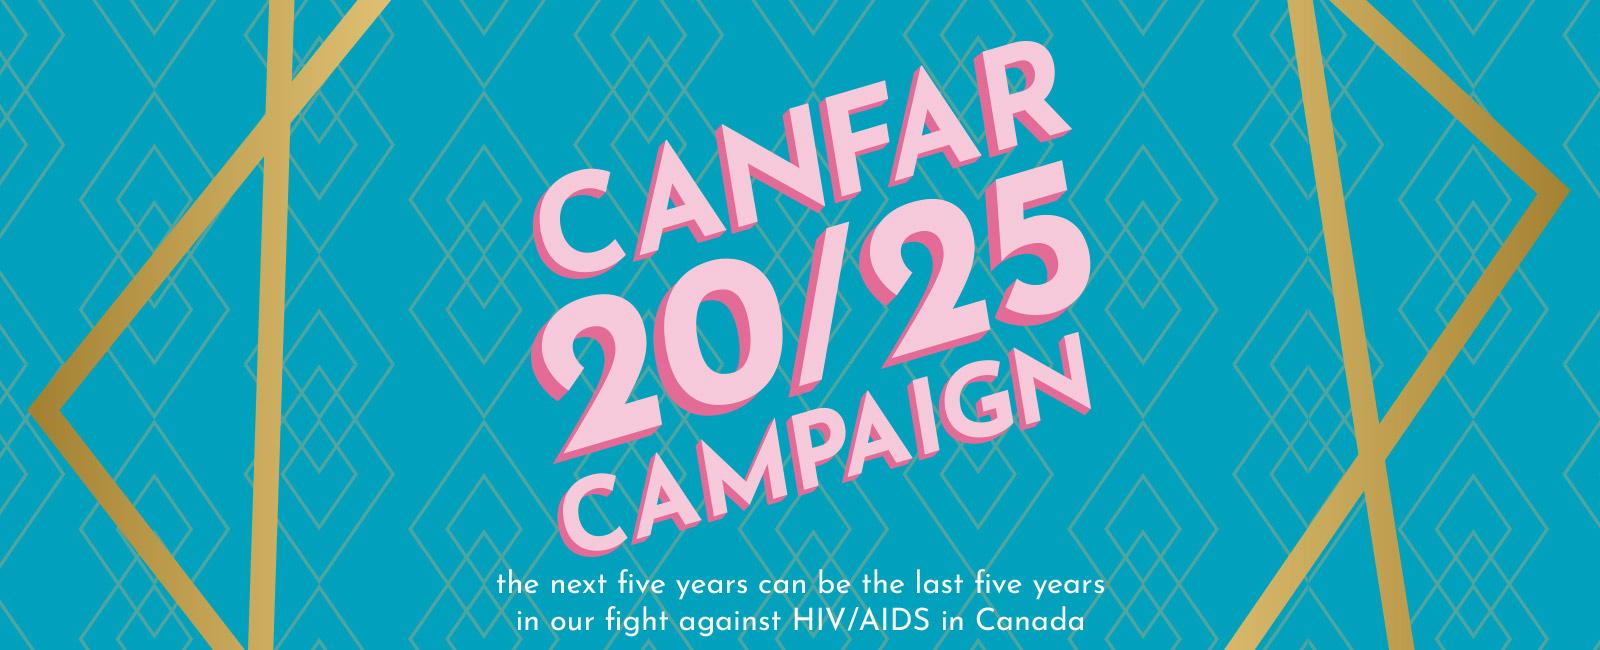 CANFAR2025